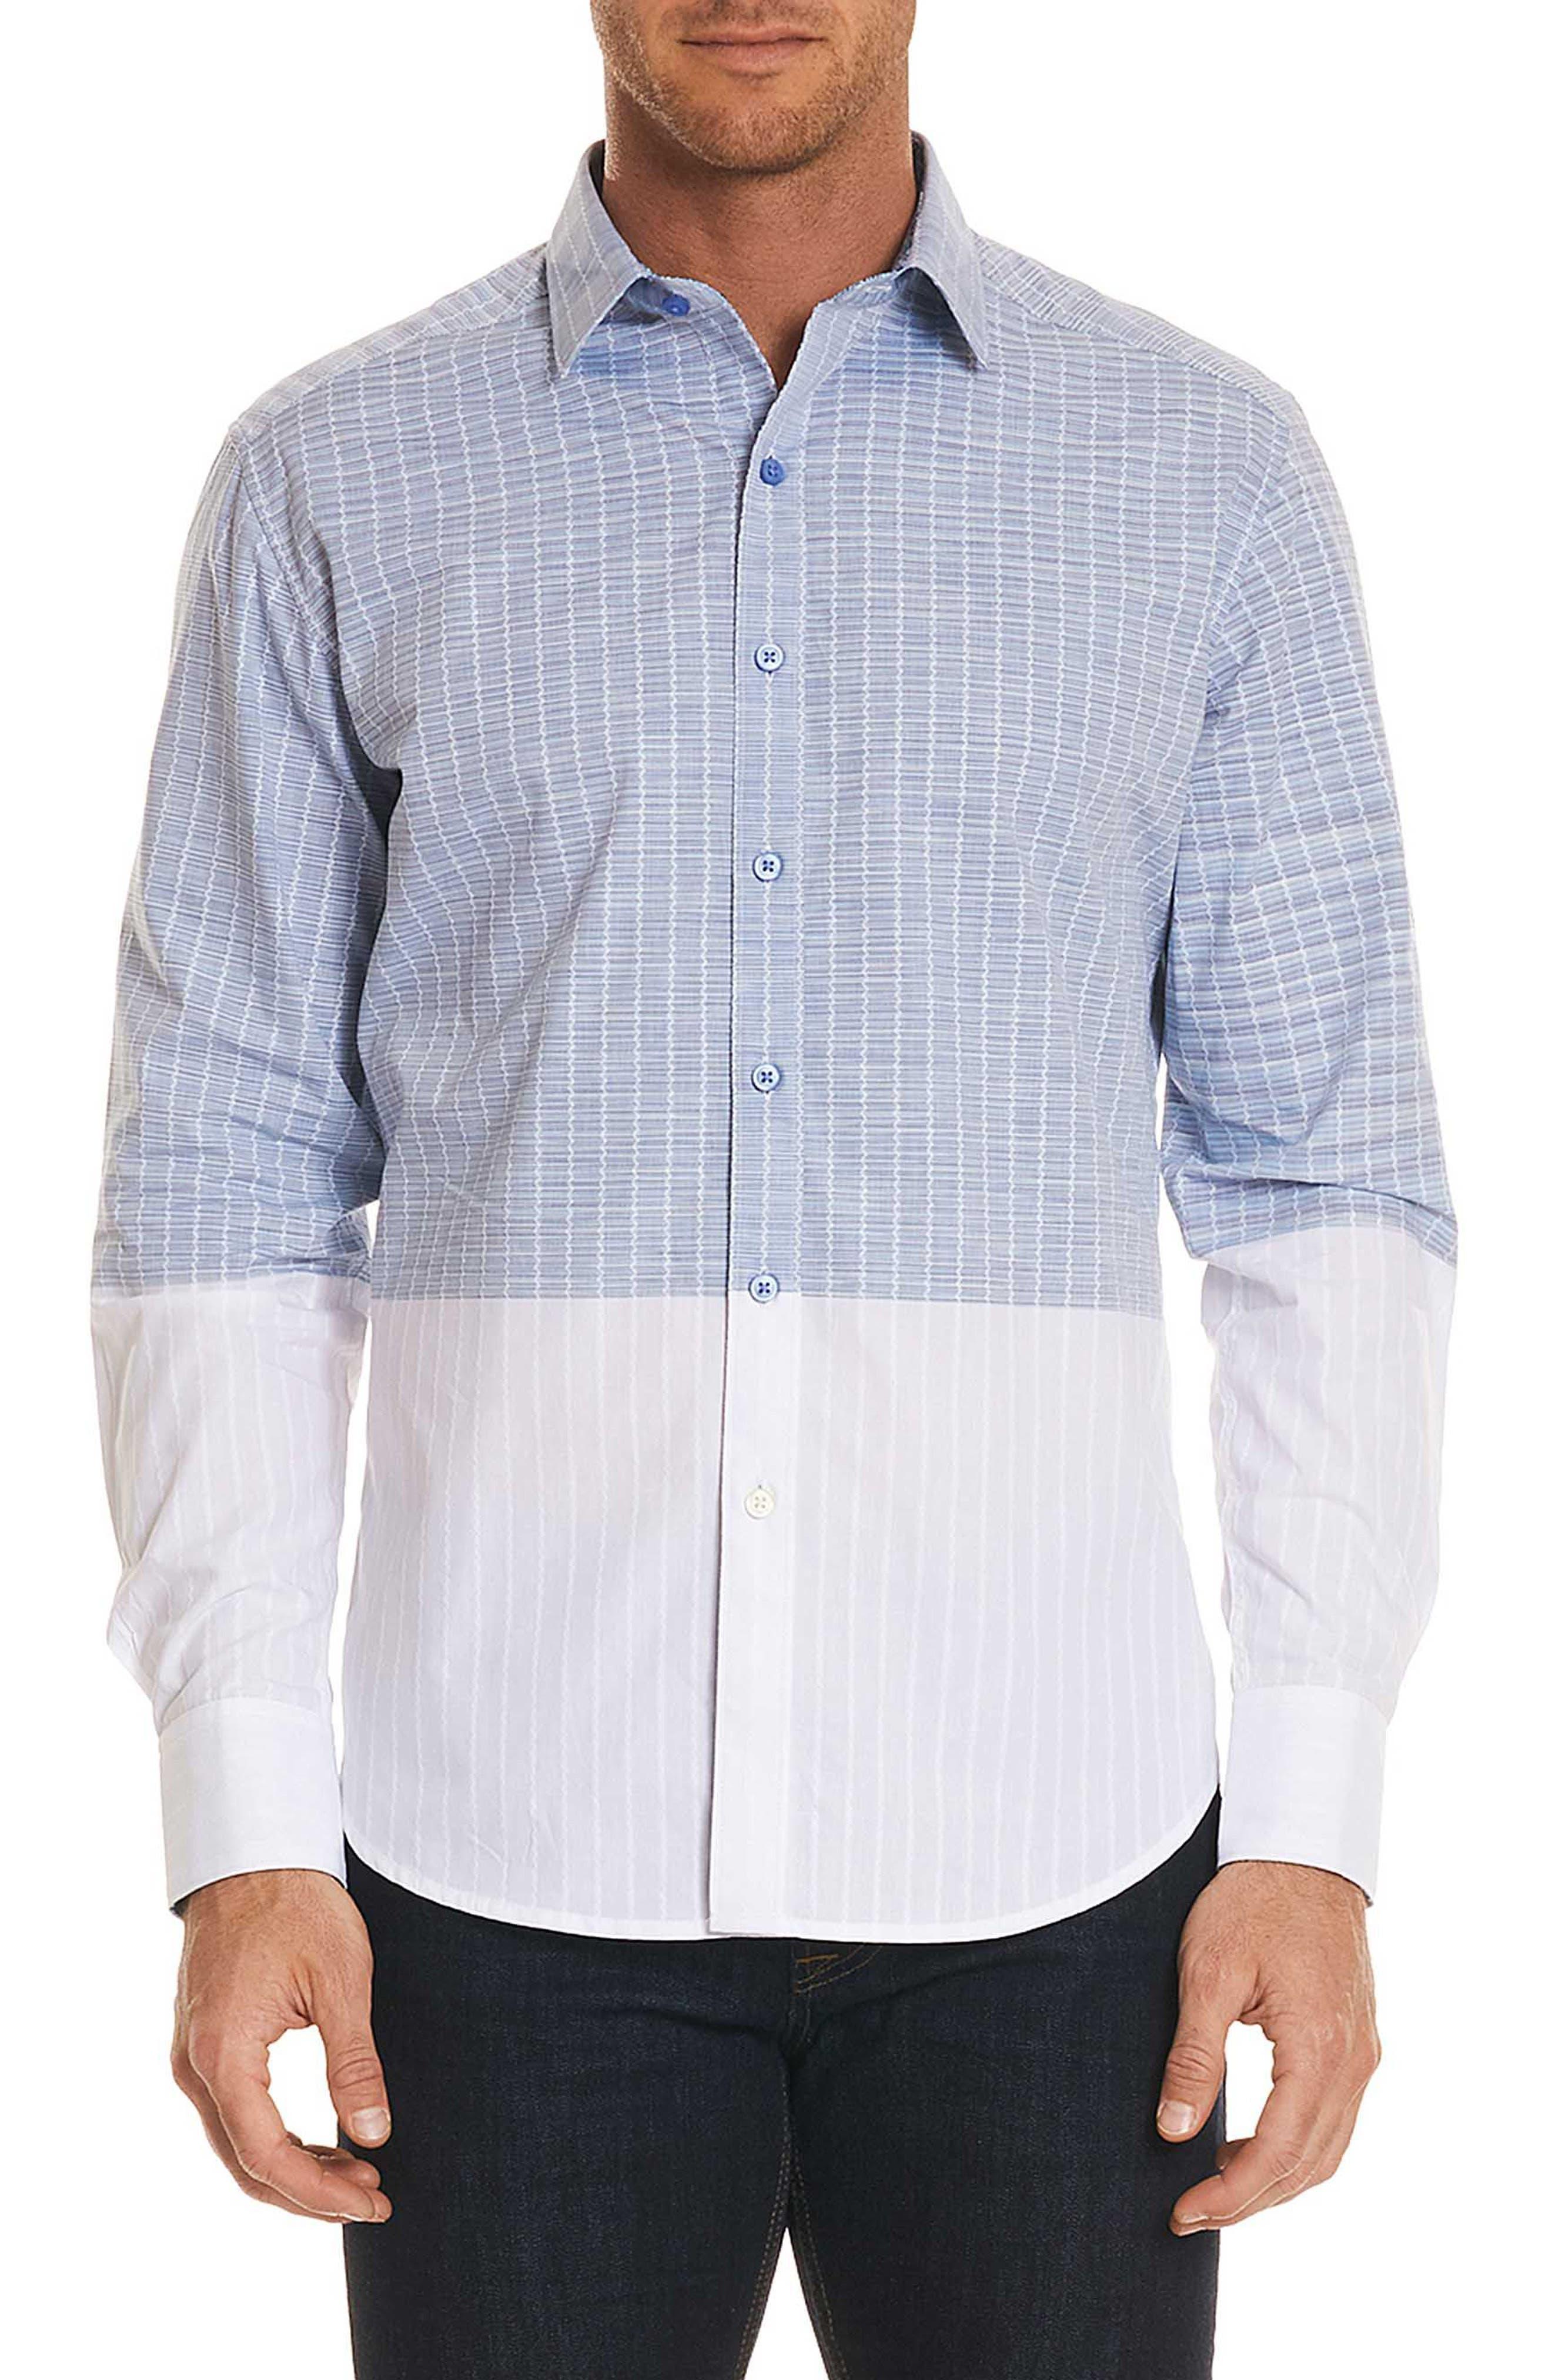 Cano Classic Fit Sport Shirt,                         Main,                         color, Blue